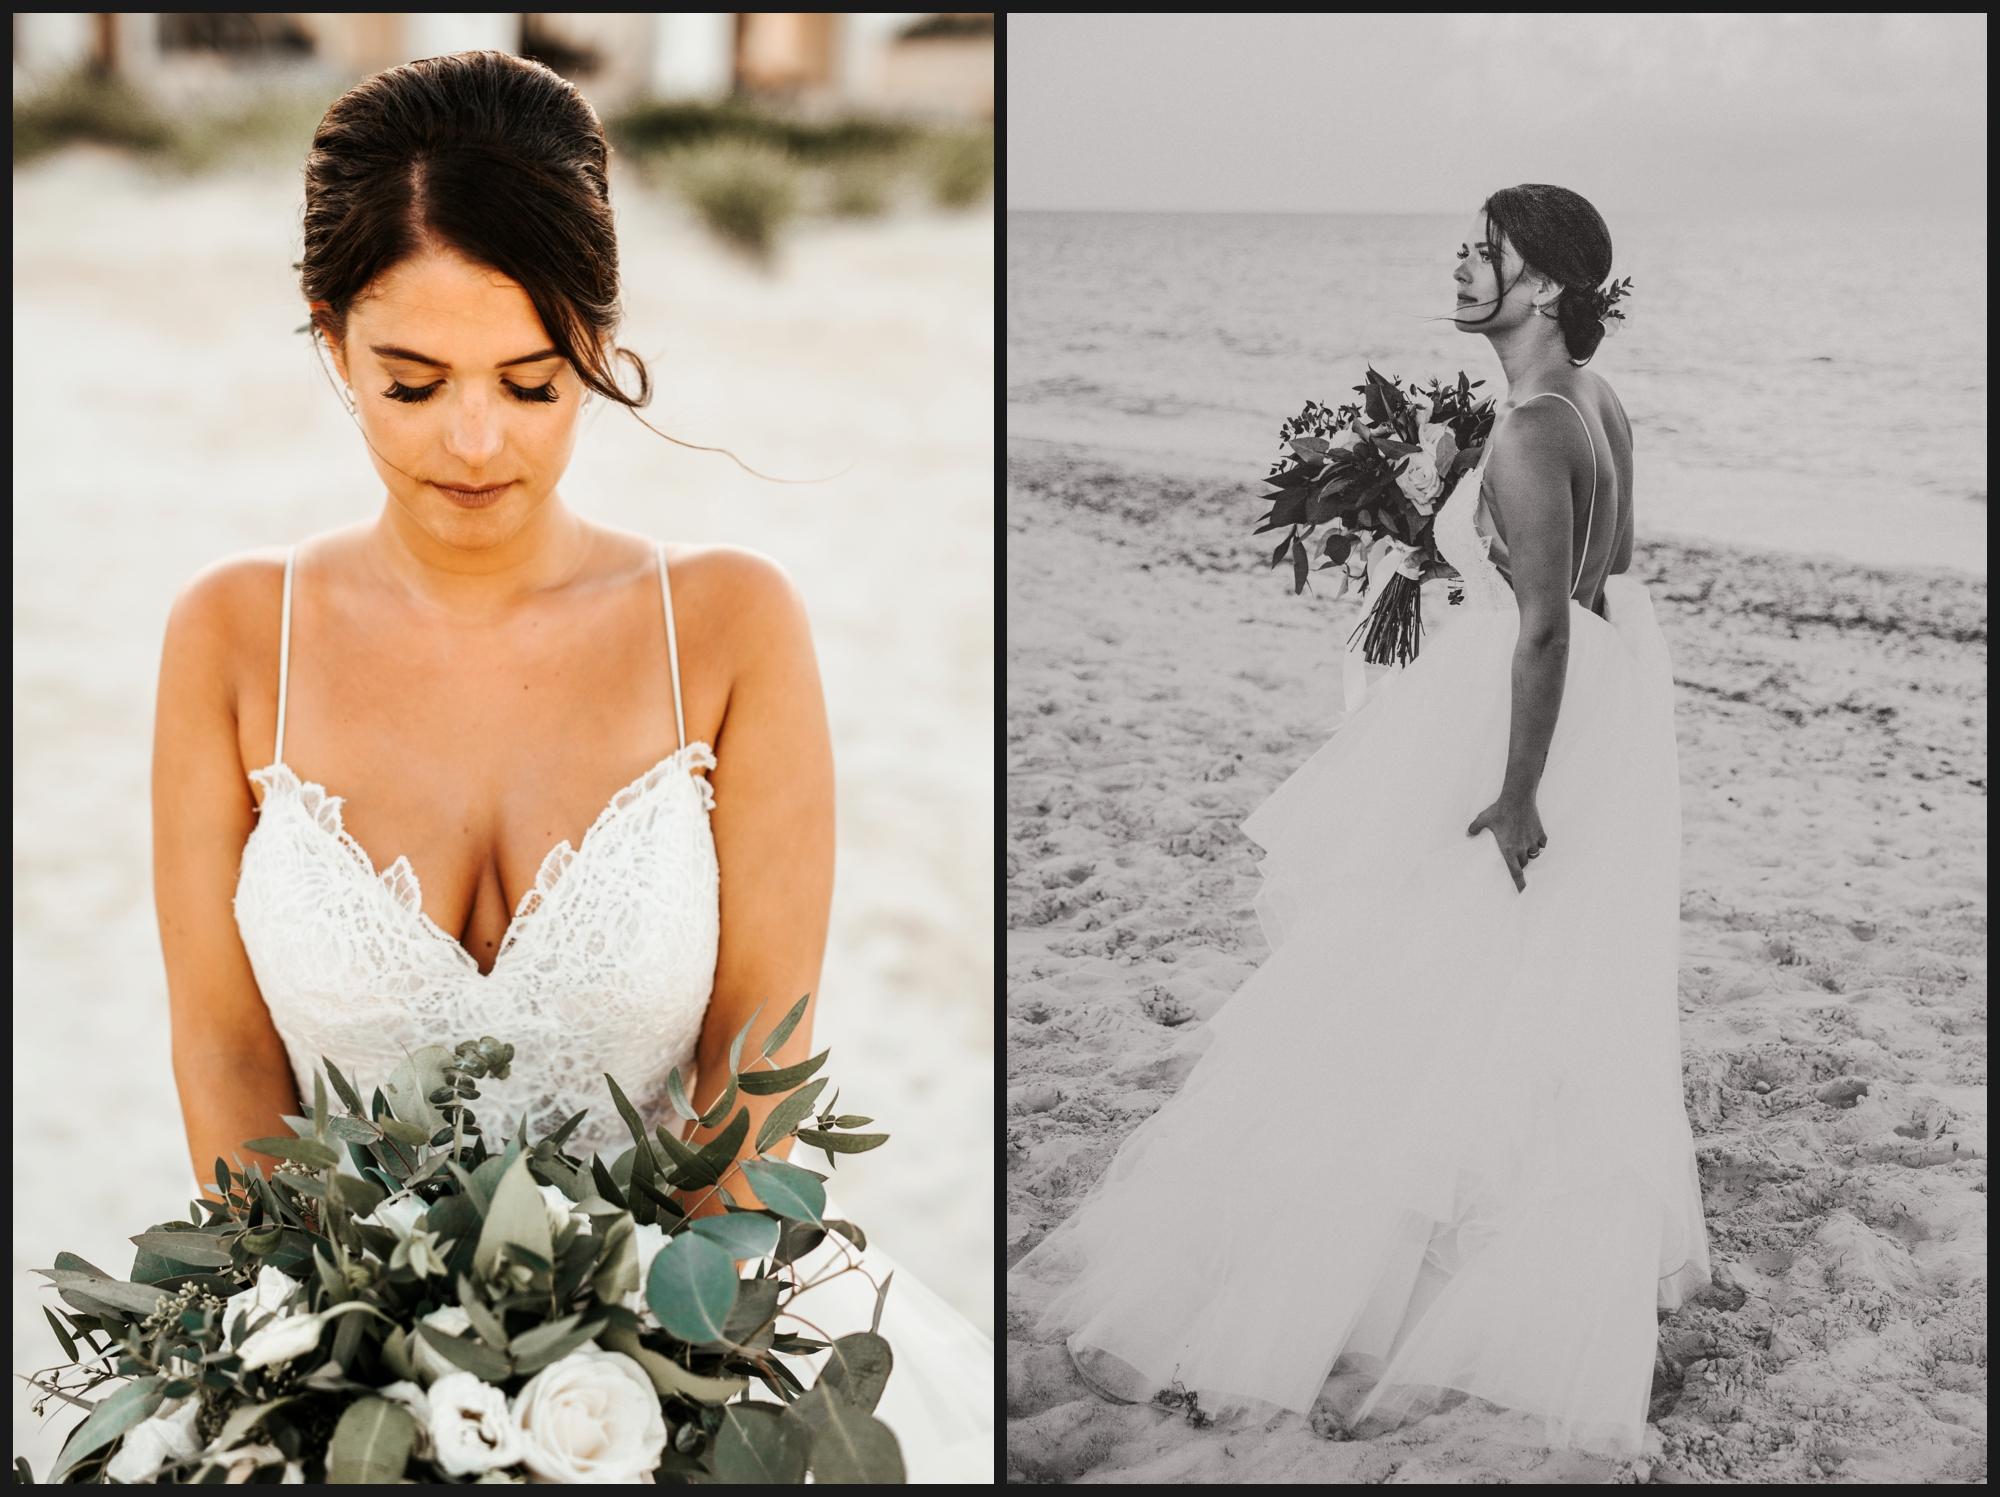 Orlando-Wedding-Photographer-destination-wedding-photographer-florida-wedding-photographer-bohemian-wedding-photographer_0474.jpg